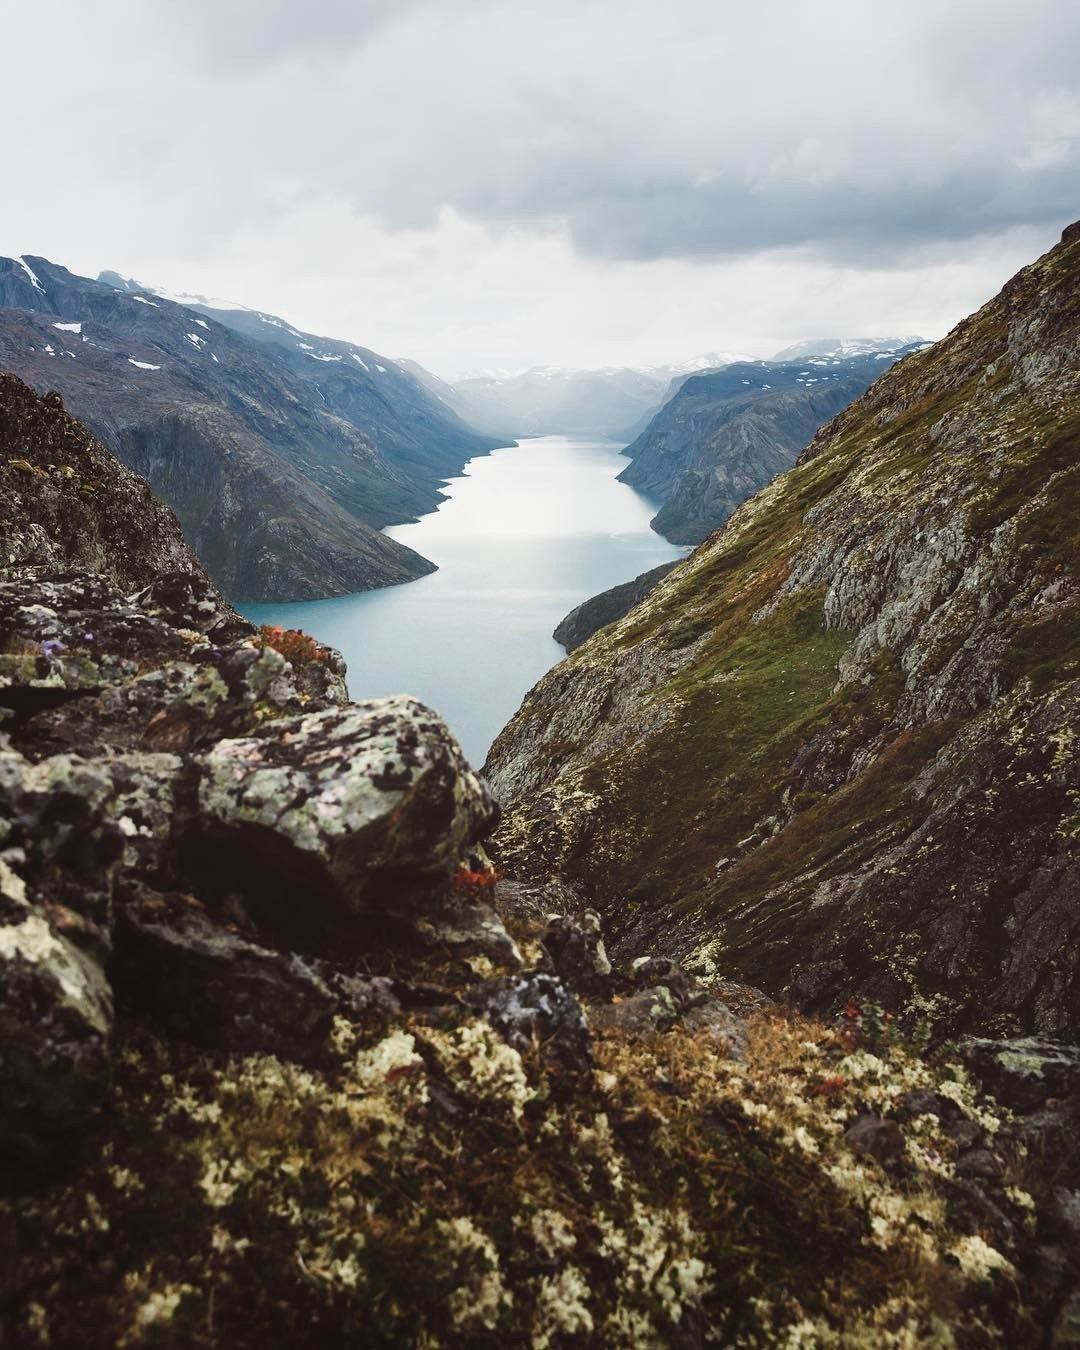 kMxz3HyQ sI - Норвегия - страна холодной красоты